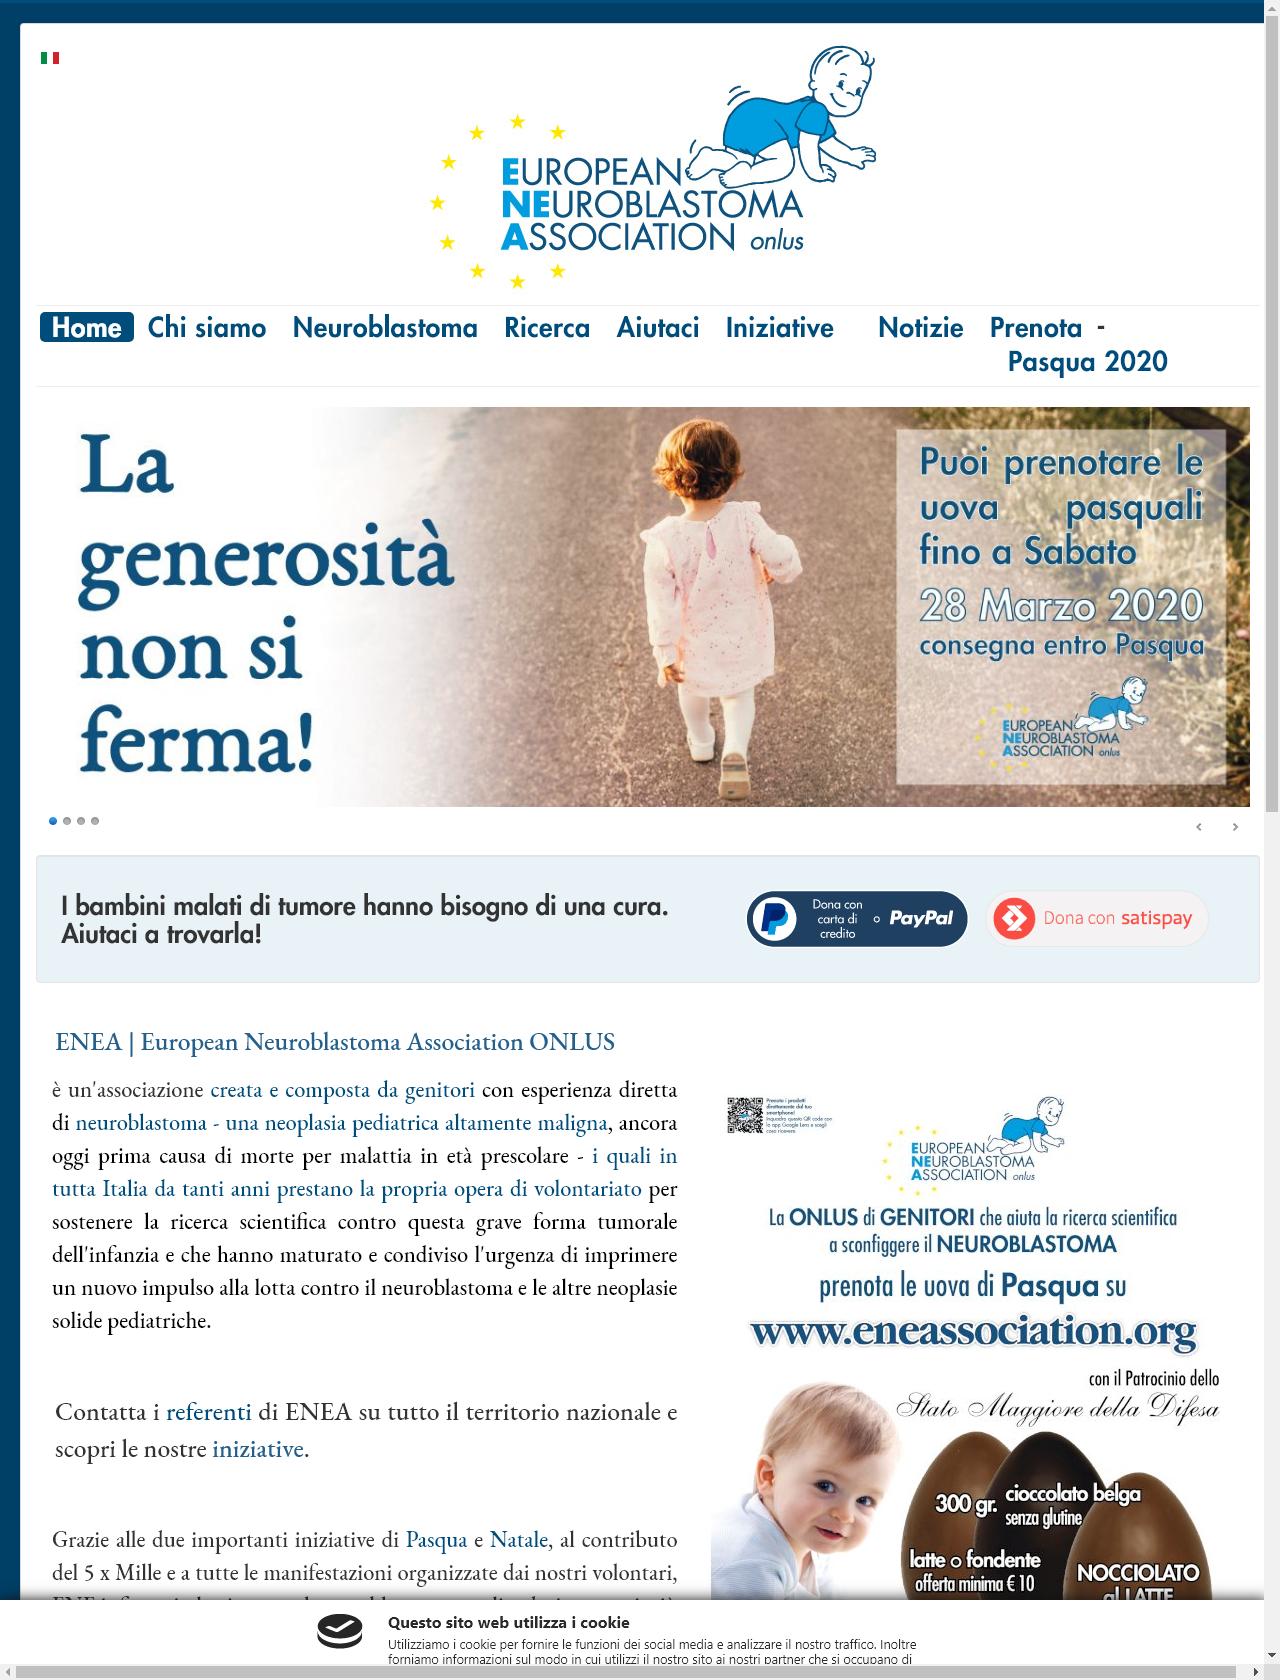 Screenshot Desktop - https://www.eneassociation.org/